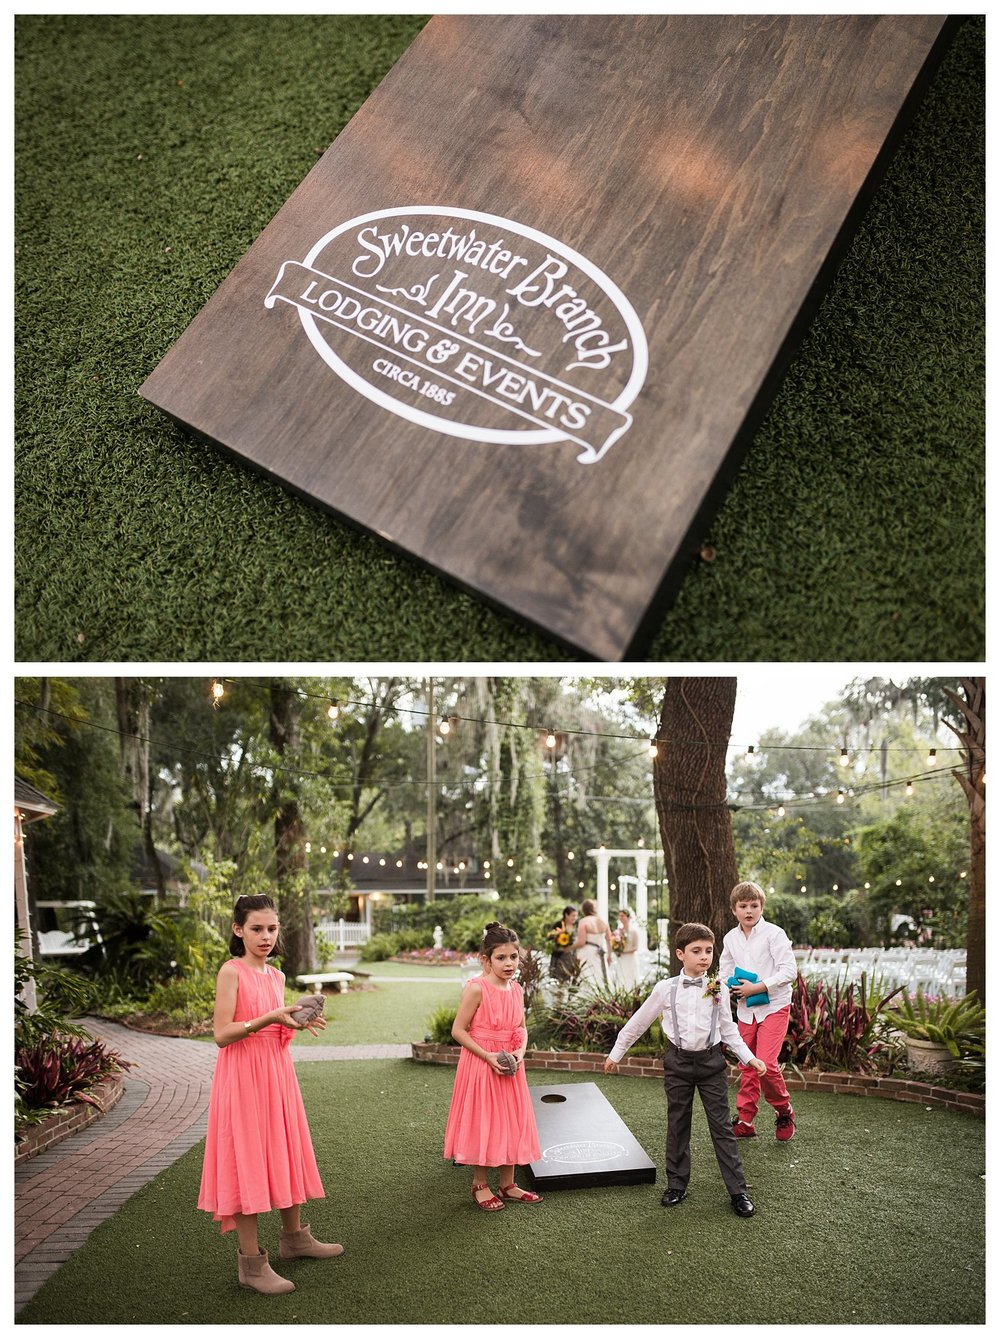 everleigh-photography-cincinnati-wedding-photographer-cincinnati-wedding-photography-sweetwater-branch-inn-gainesville-florida-wedding-44